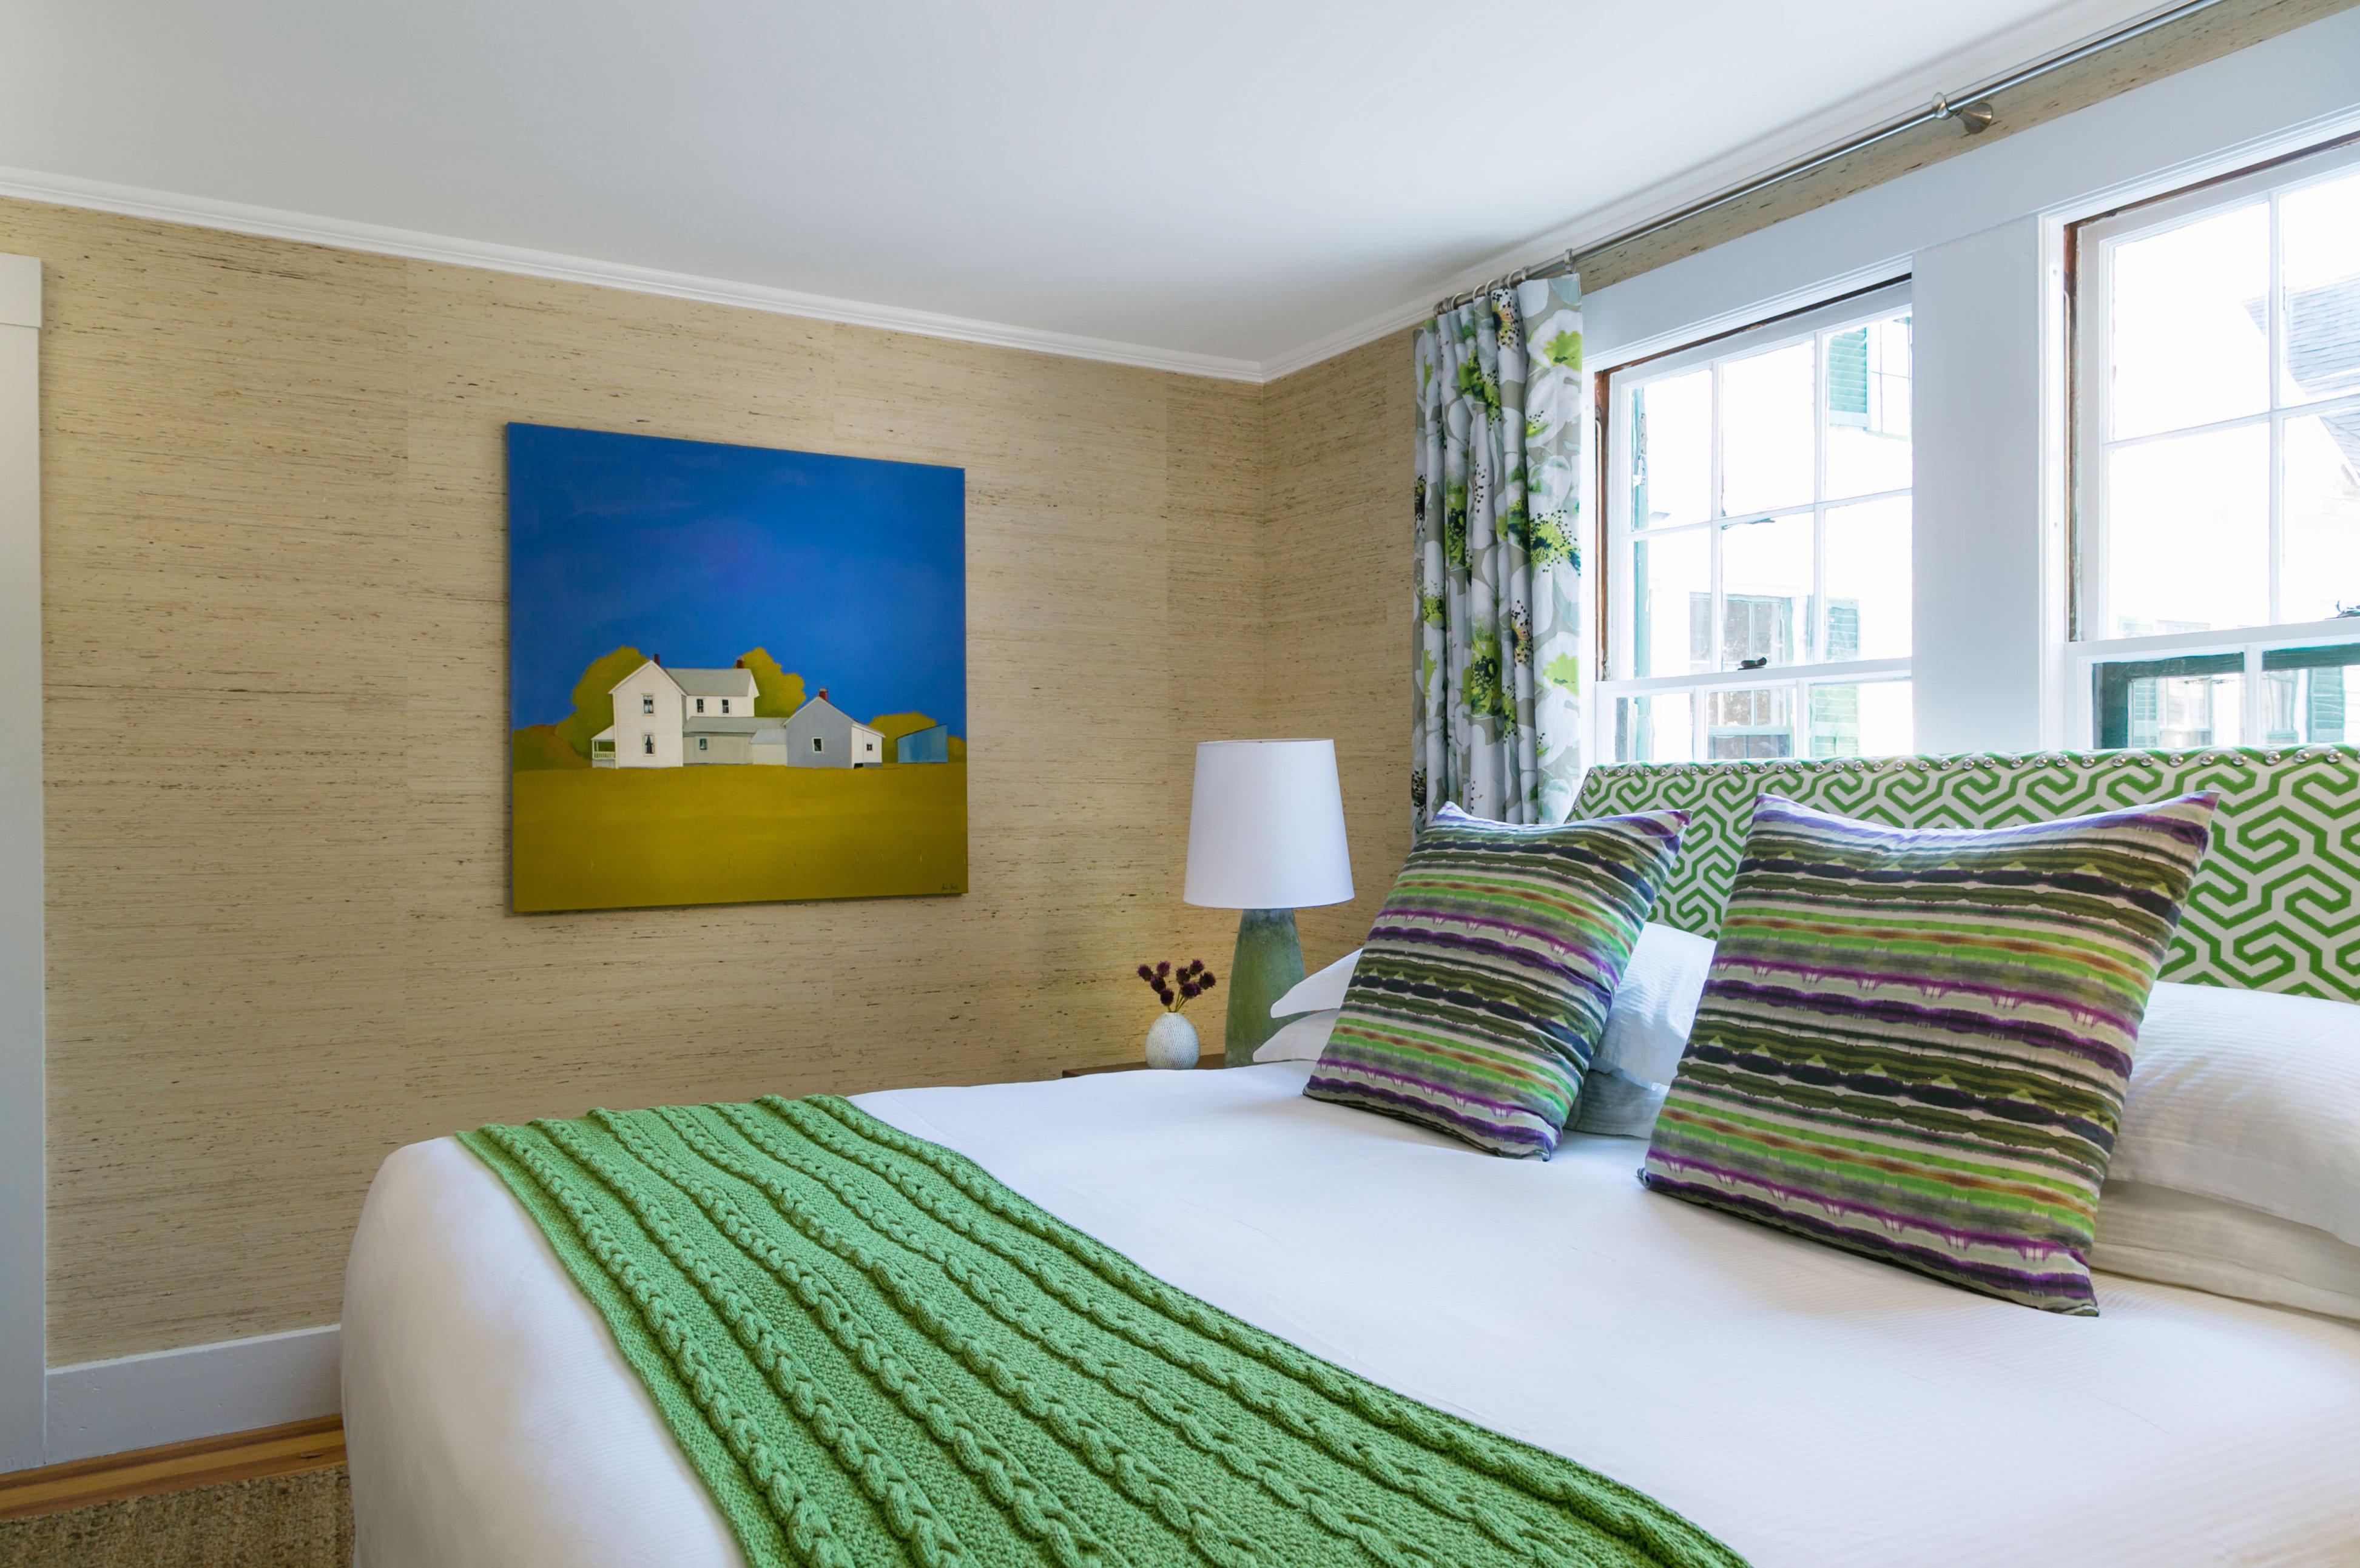 green sofa property Bedroom pillow condominium home Suite bed sheet living room